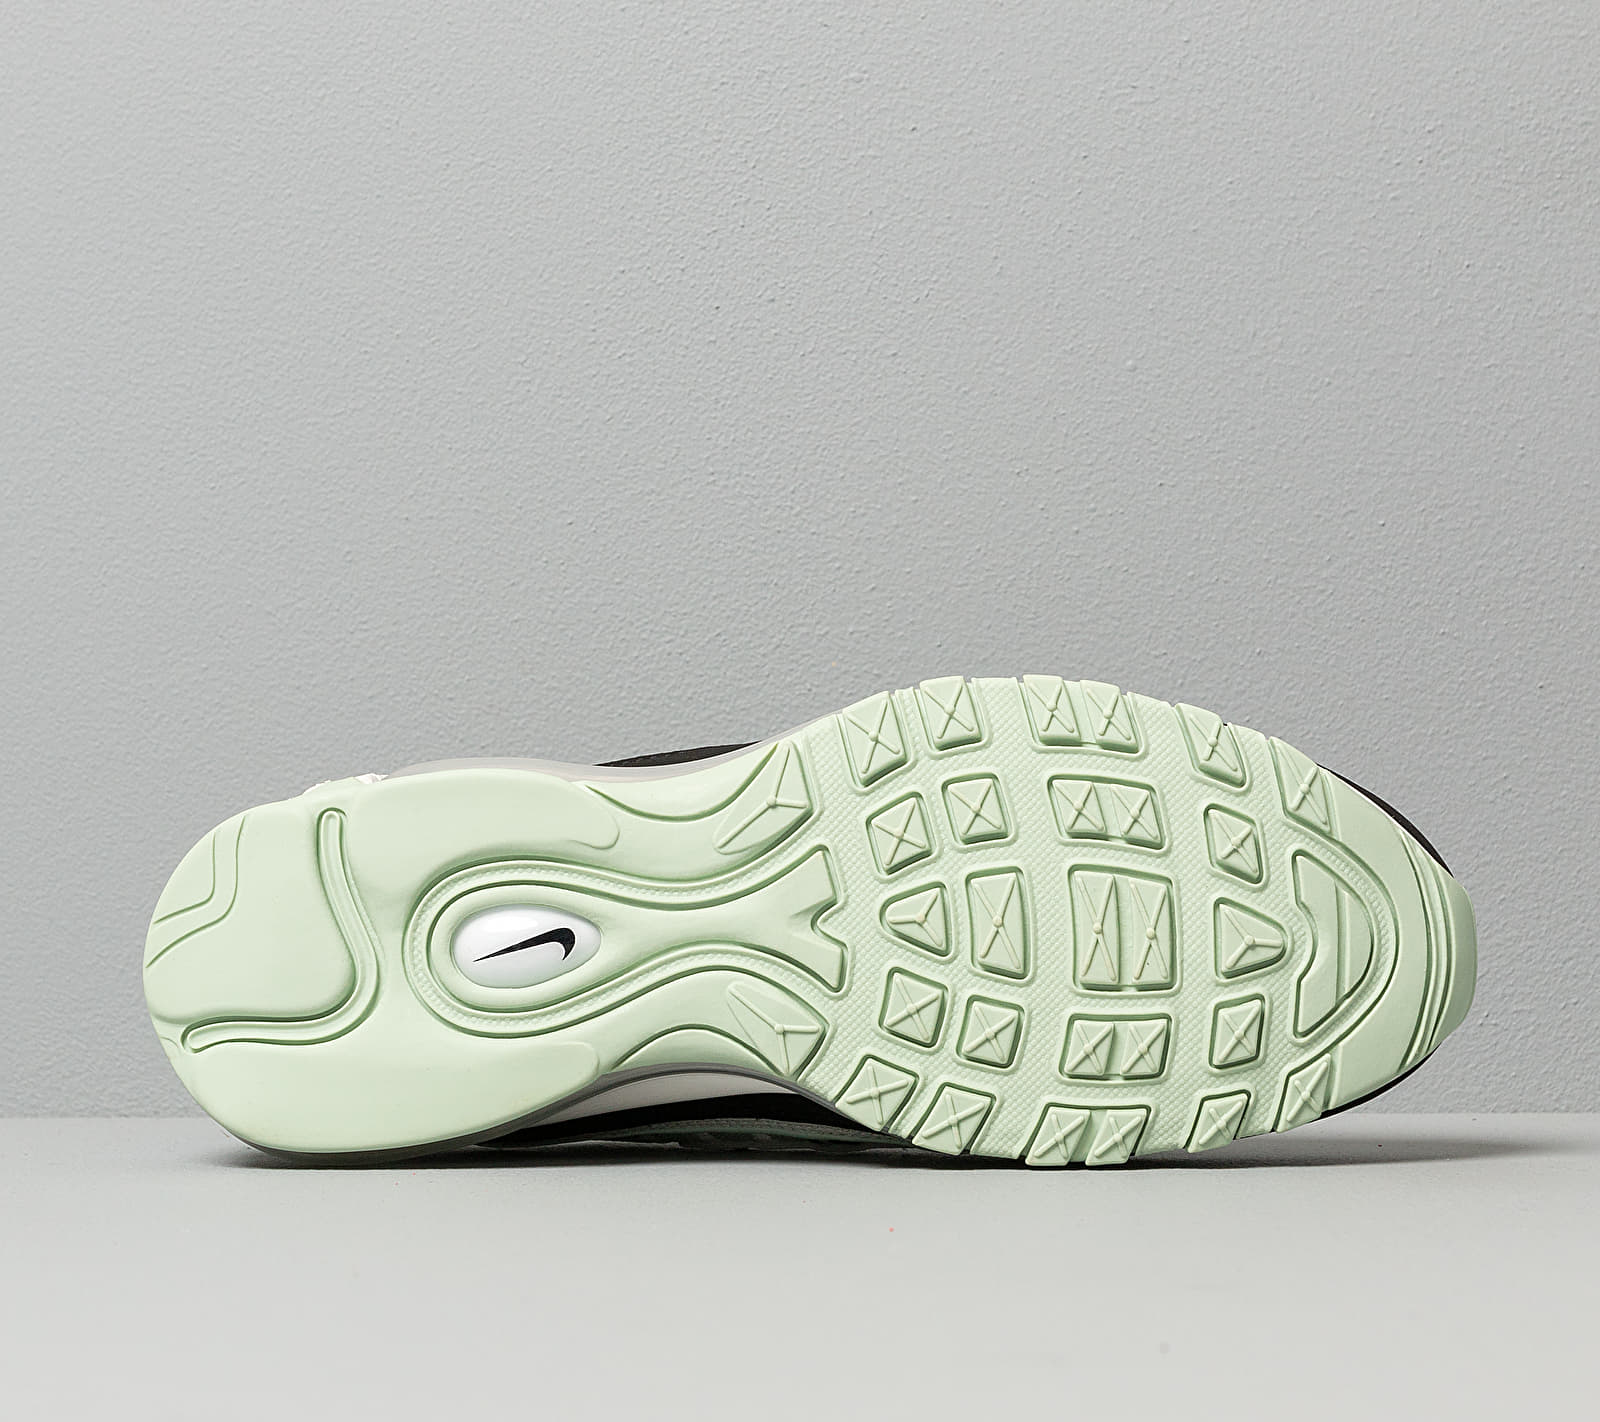 Nike W Air Max 98 Pistachio Frost/ Pistachio Frost-Black, Green